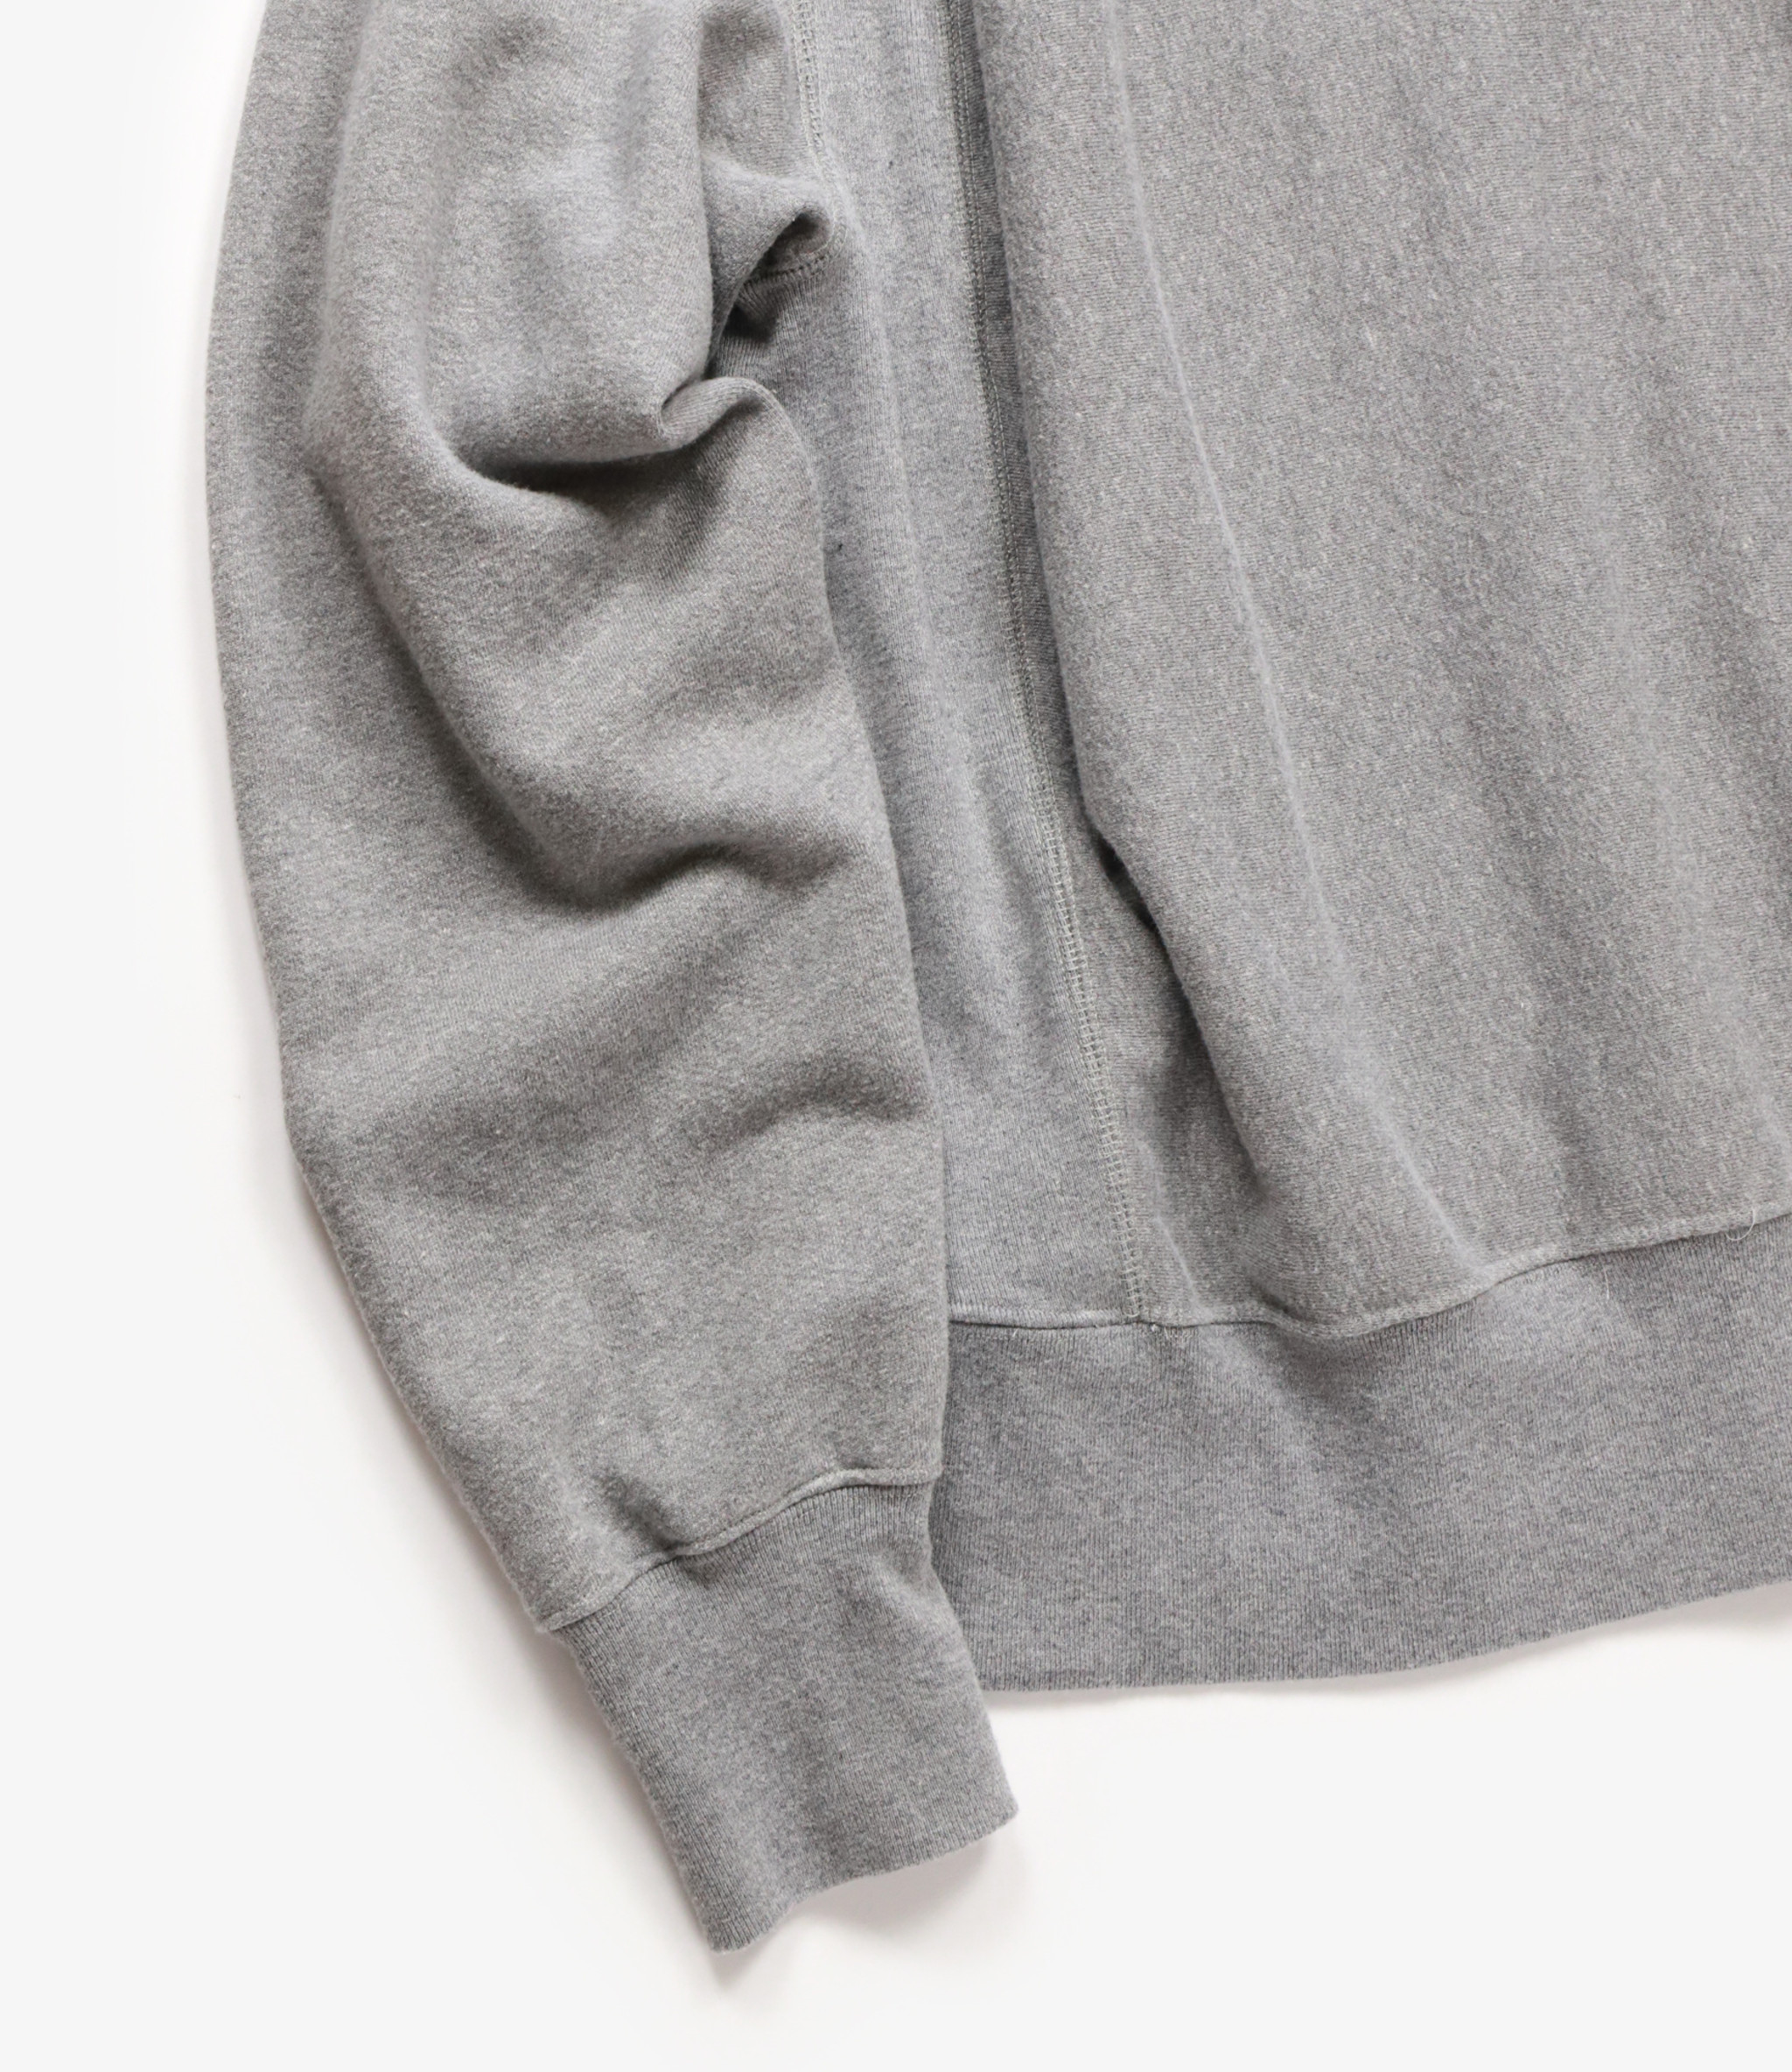 Engineered Garments Raglan Crew - Heather Grey PC Fleece